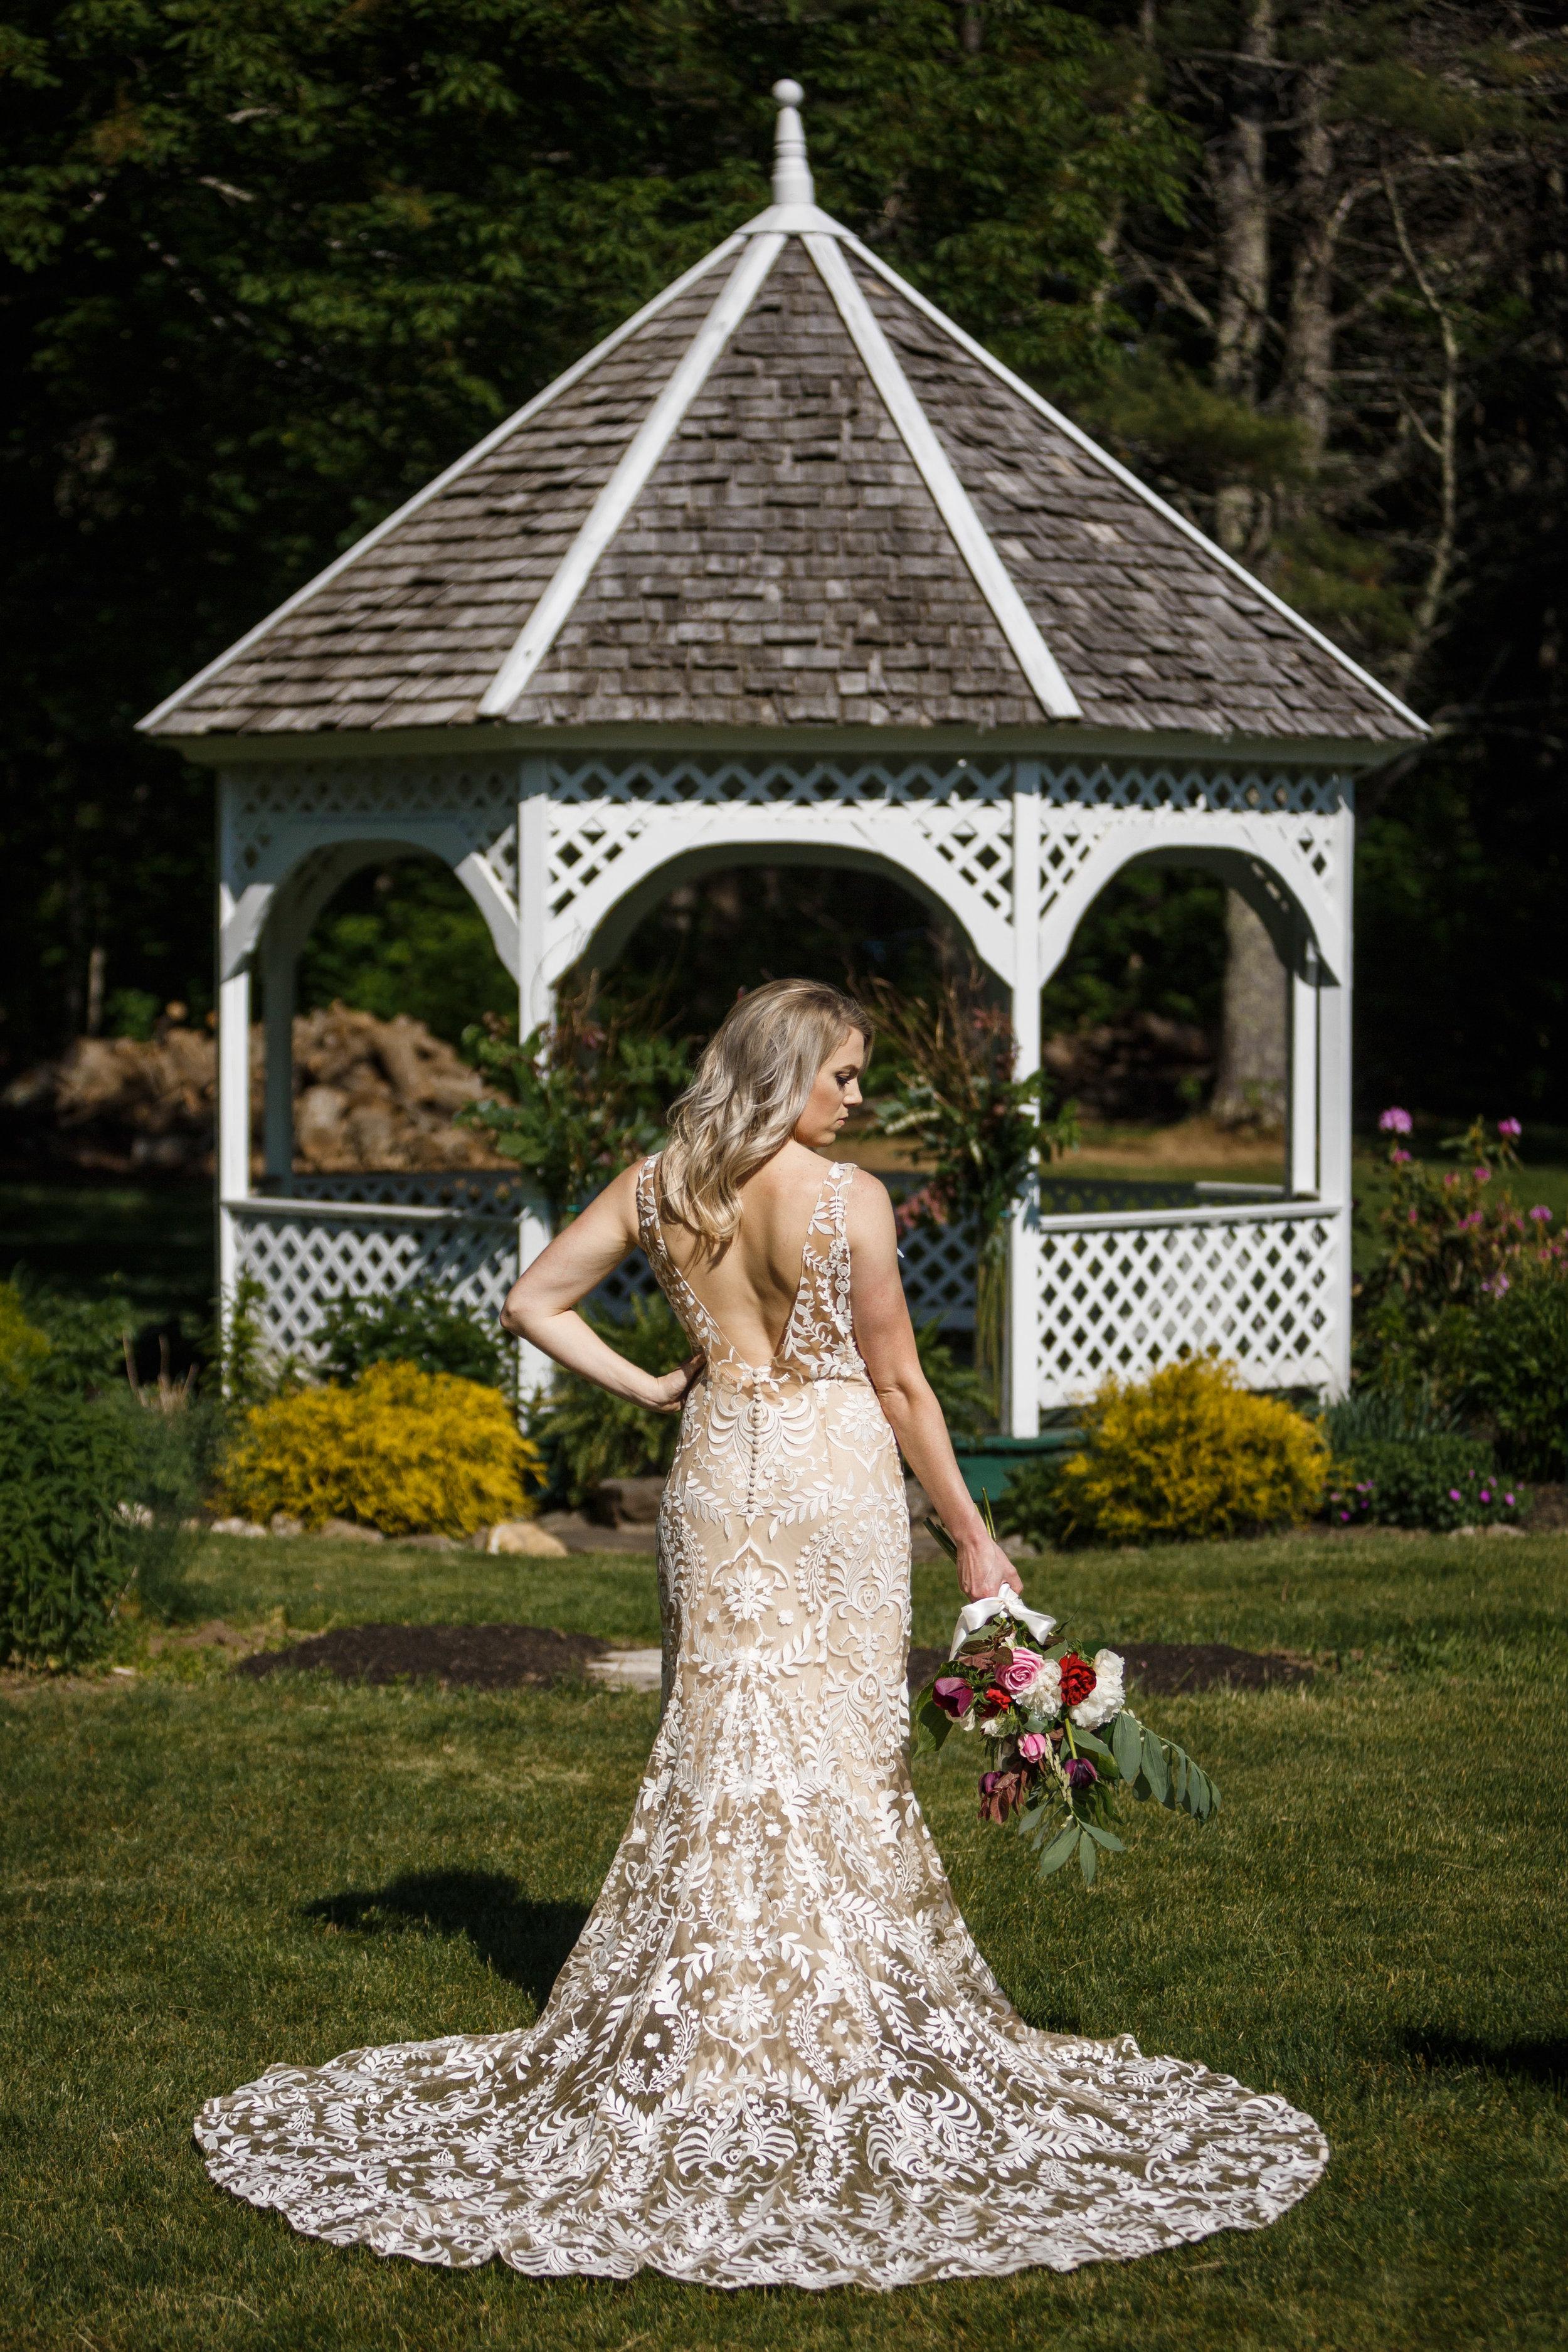 87_maple_moon_farm_lulu_and_co_inspiration_shoot_lebanon_maine_wedding_photographer_whitney_j_fox_8776.jpg